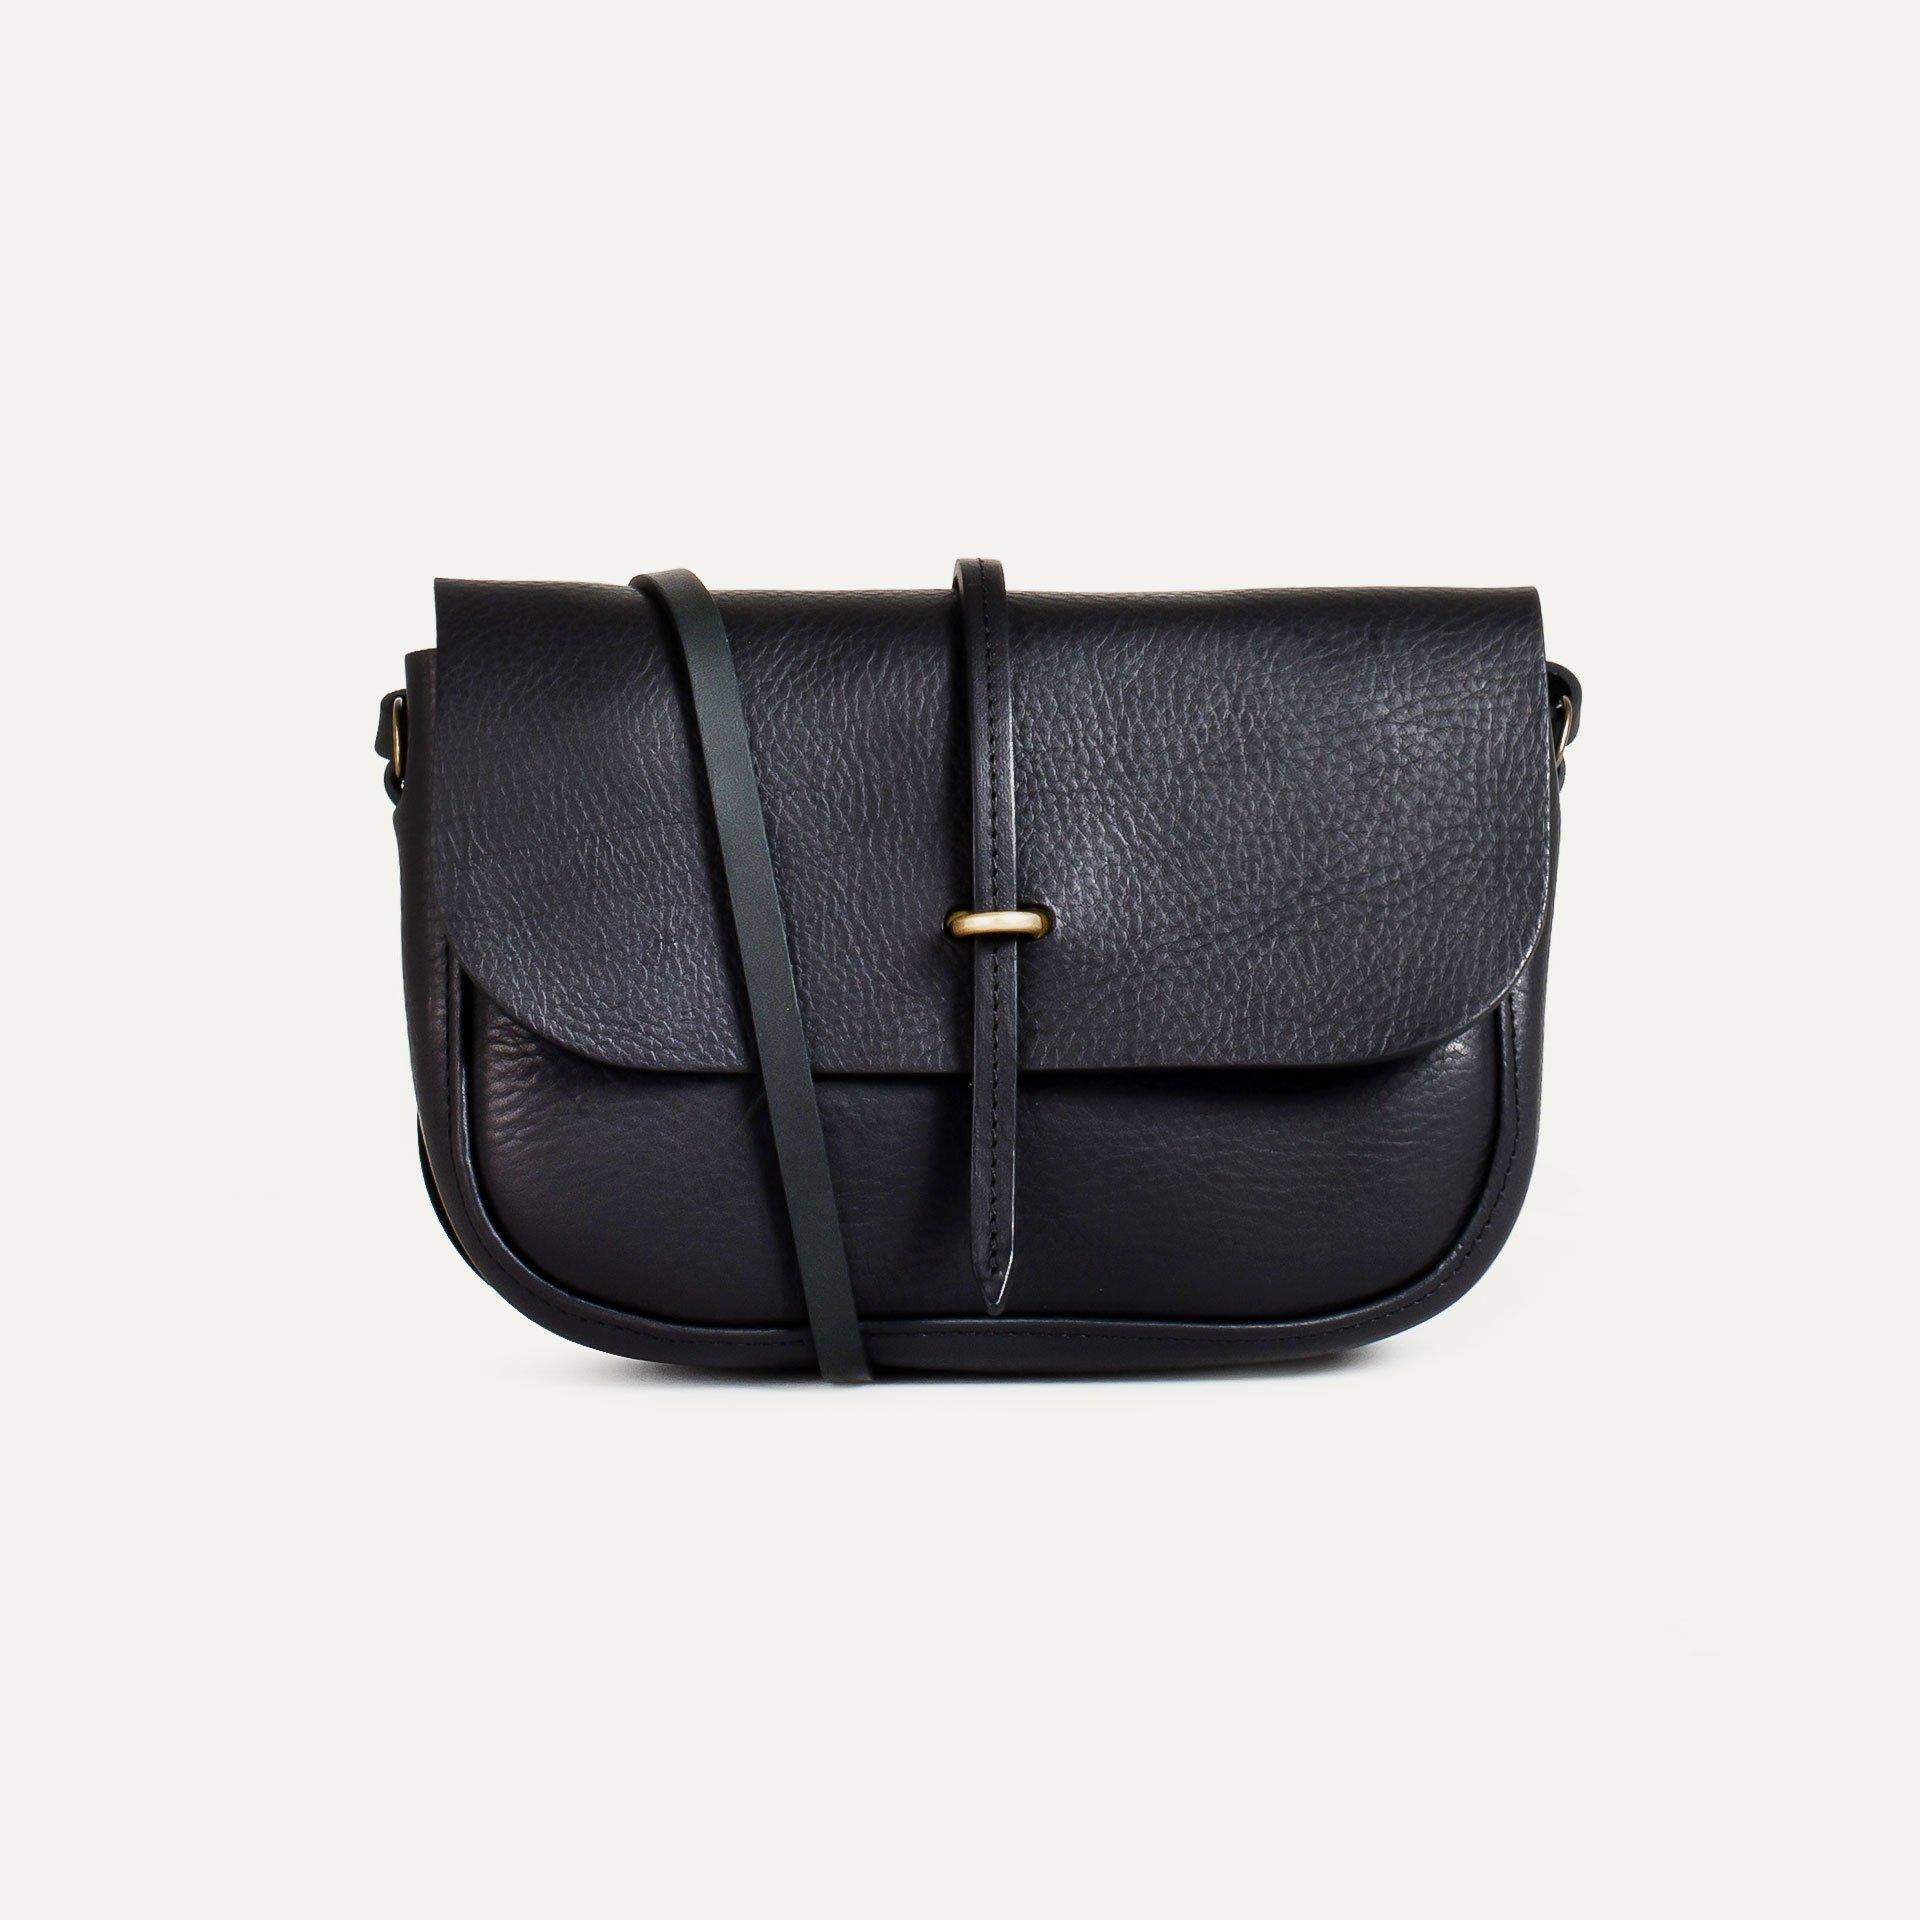 Pastis handbag - Black (image n°1)